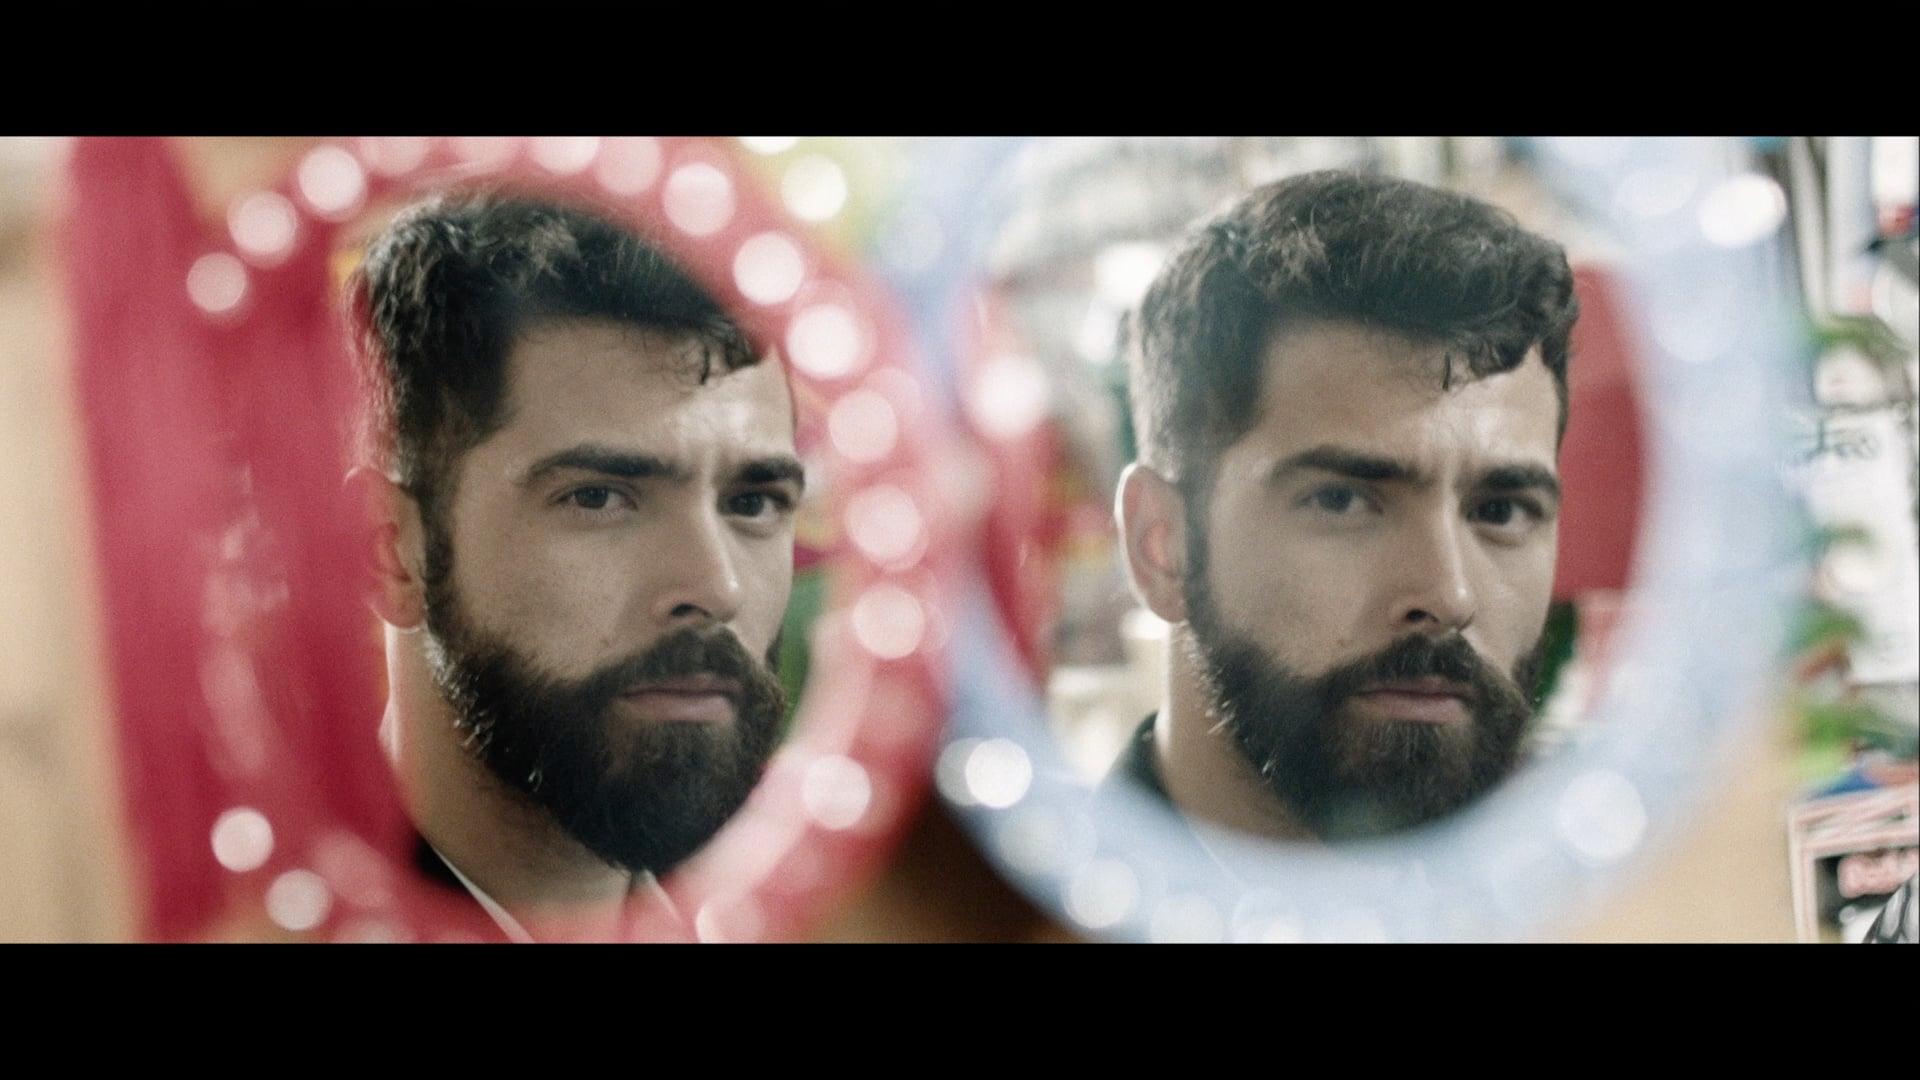 EL ZEN DEL CHAT - JULIAN CASTRO & ALEJO ROSENBERG - SHORT FILM